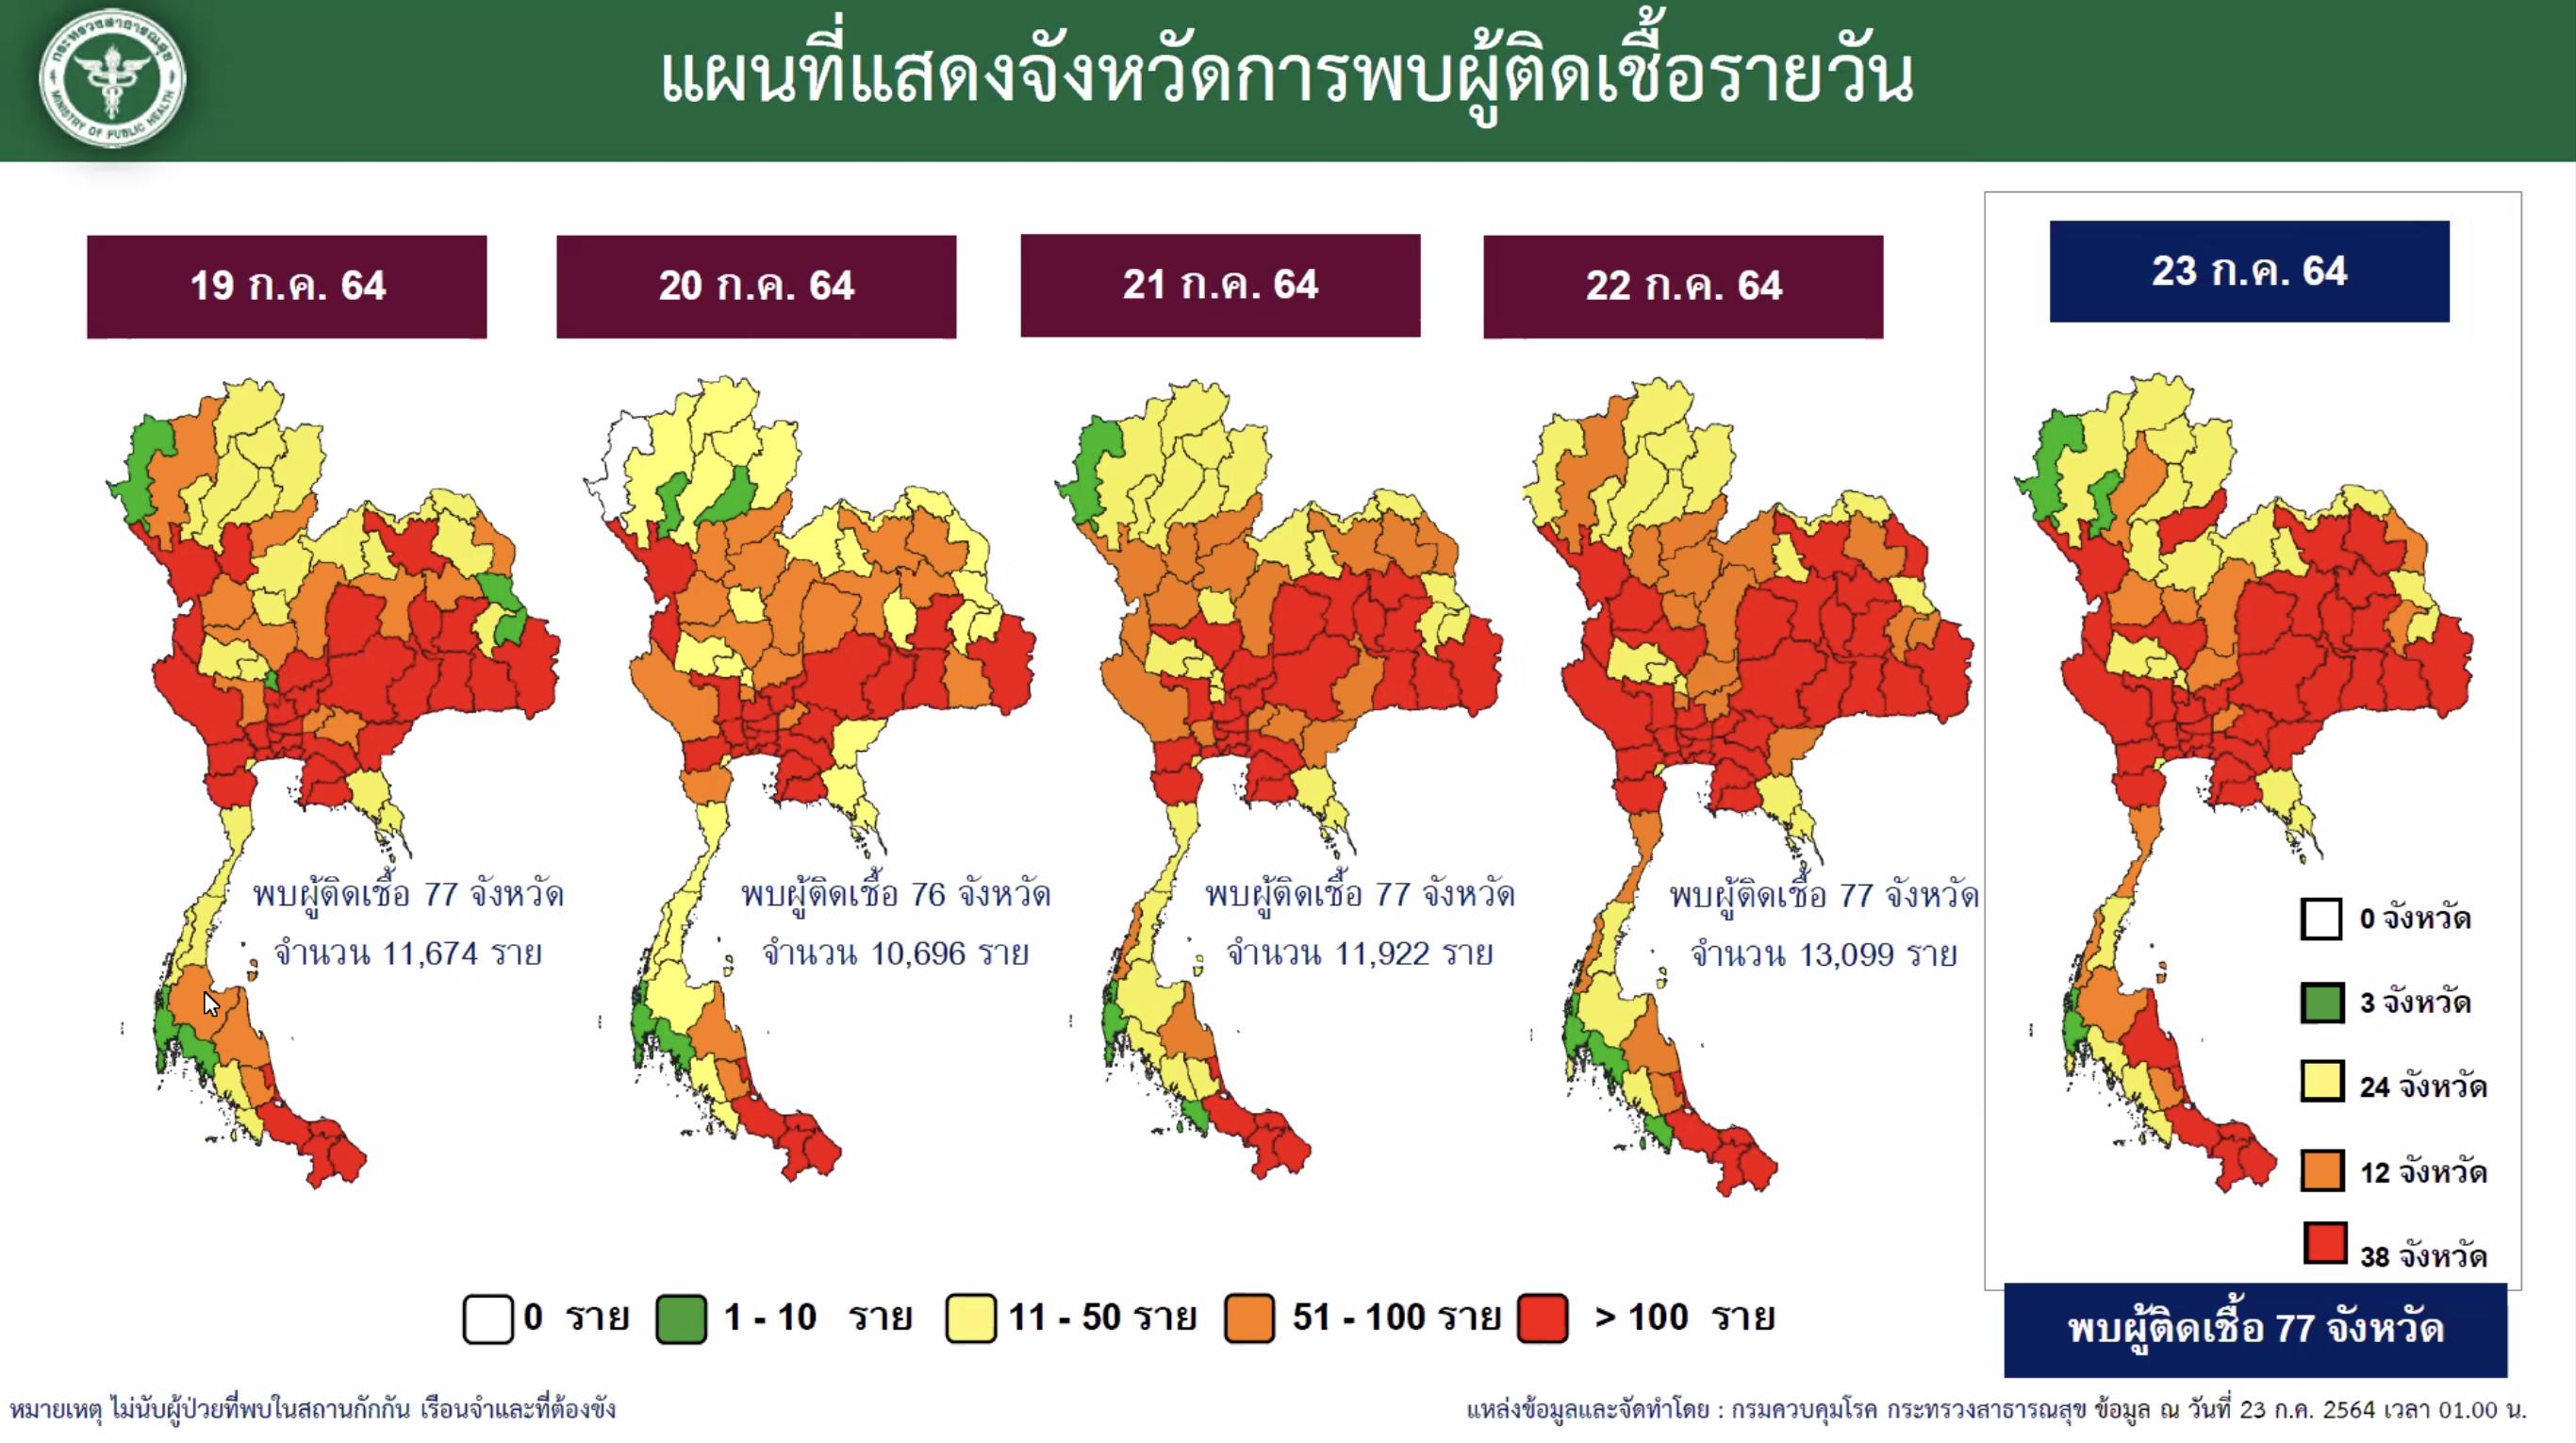 www.thaiguide.dk/images/forum/covid19/spredning%2023-07-21.jpeg